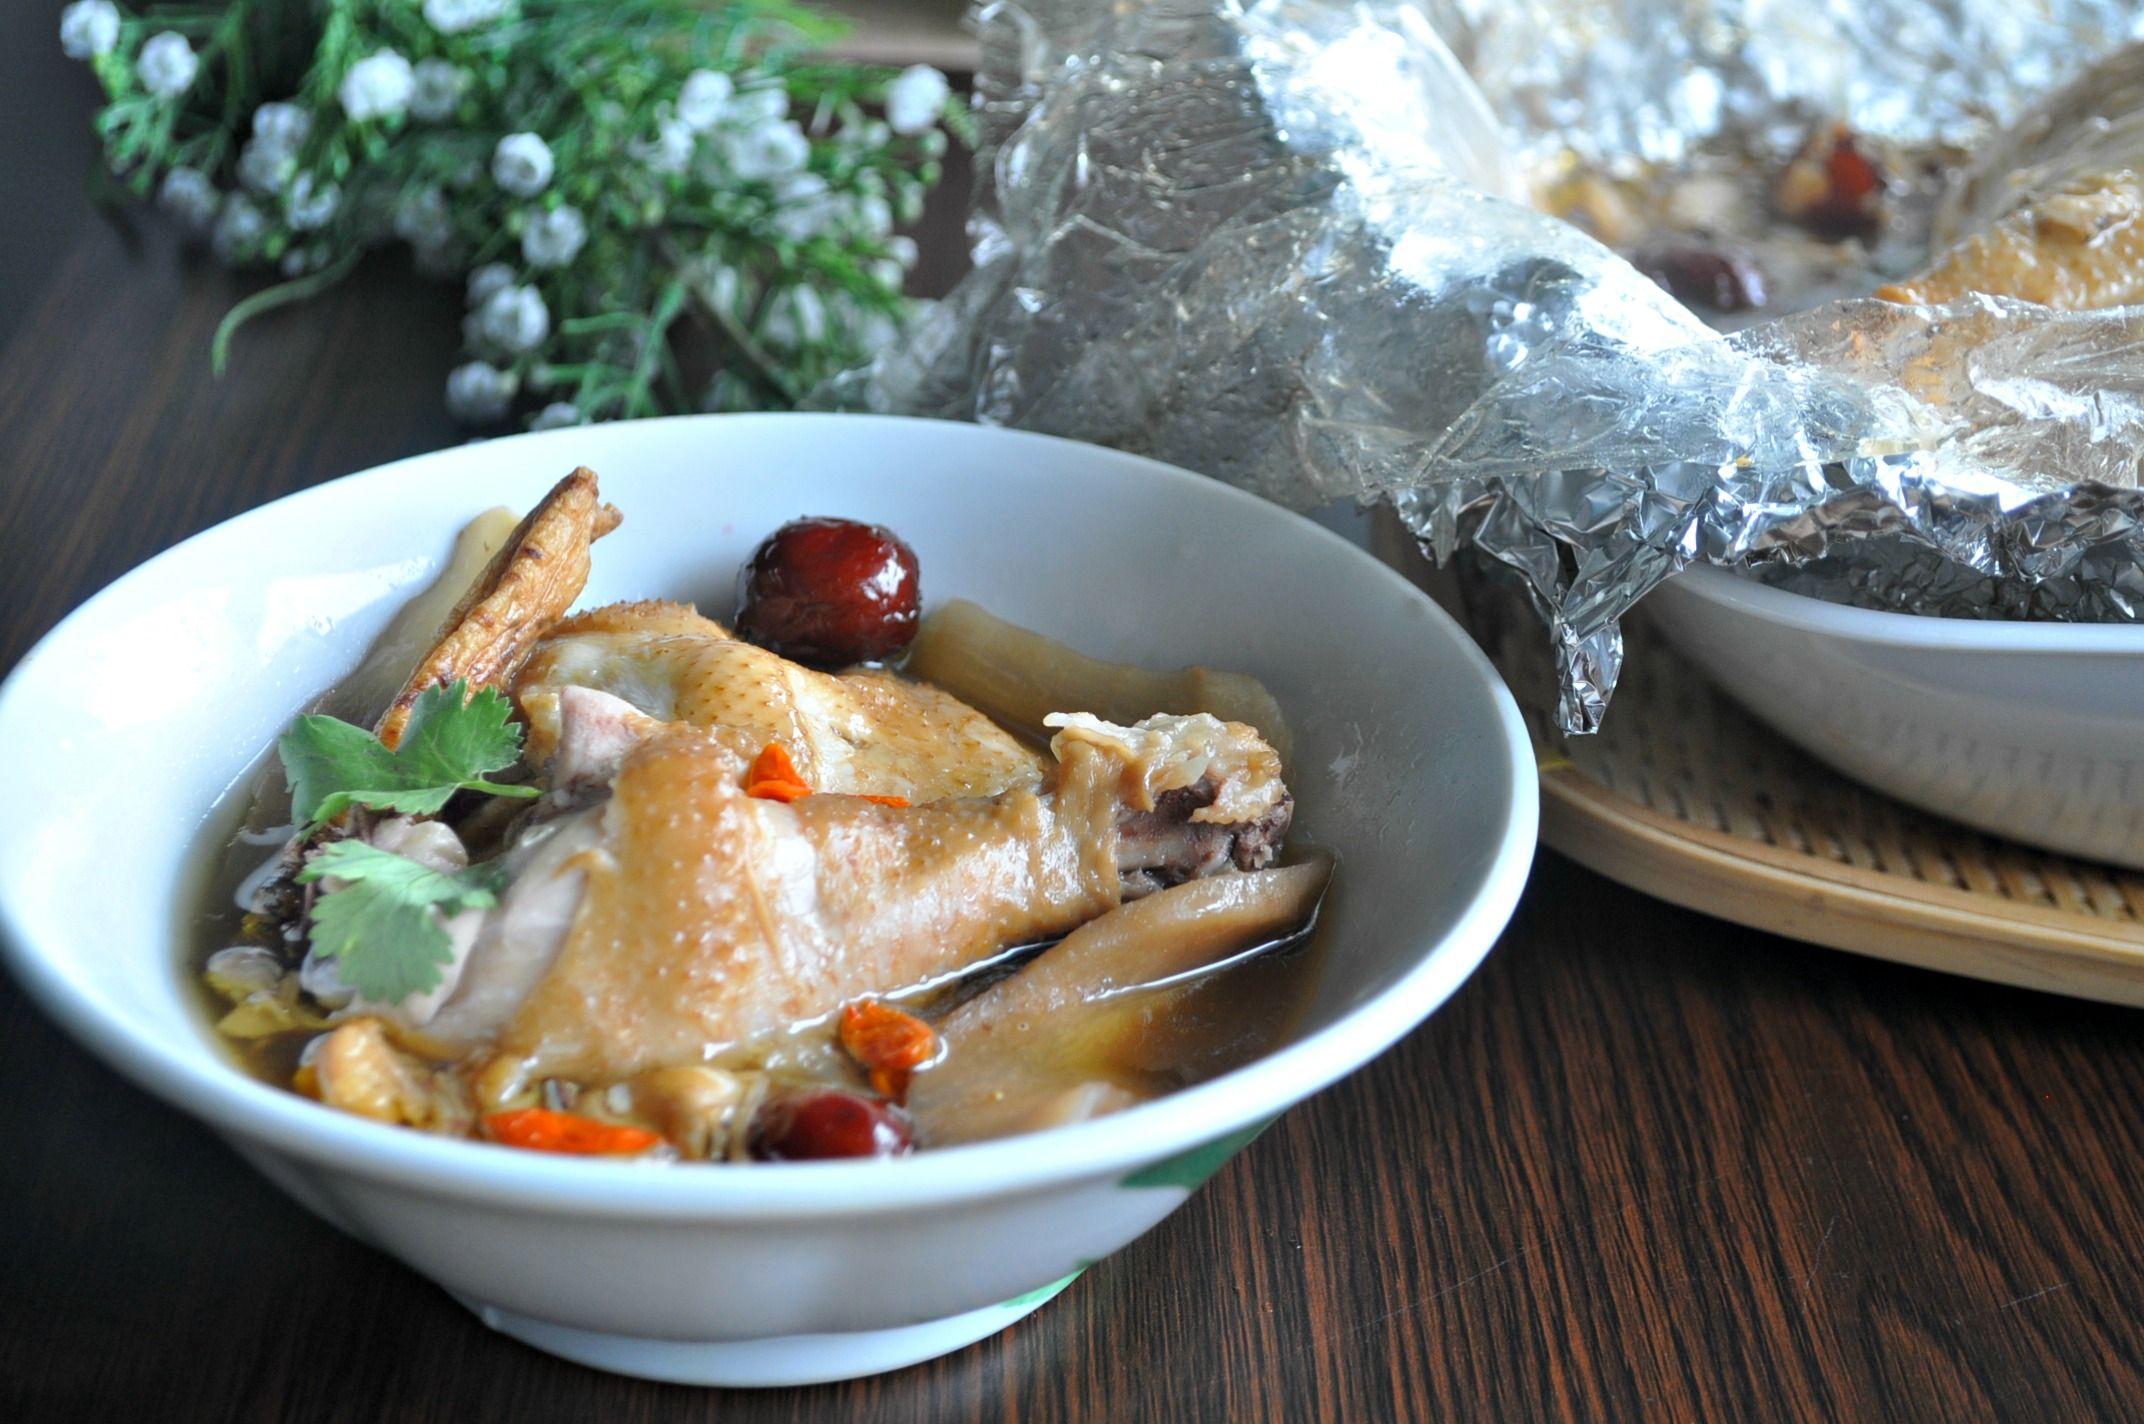 Emperor herbal chicken 药材皇帝鸡 eat what tonight recipe